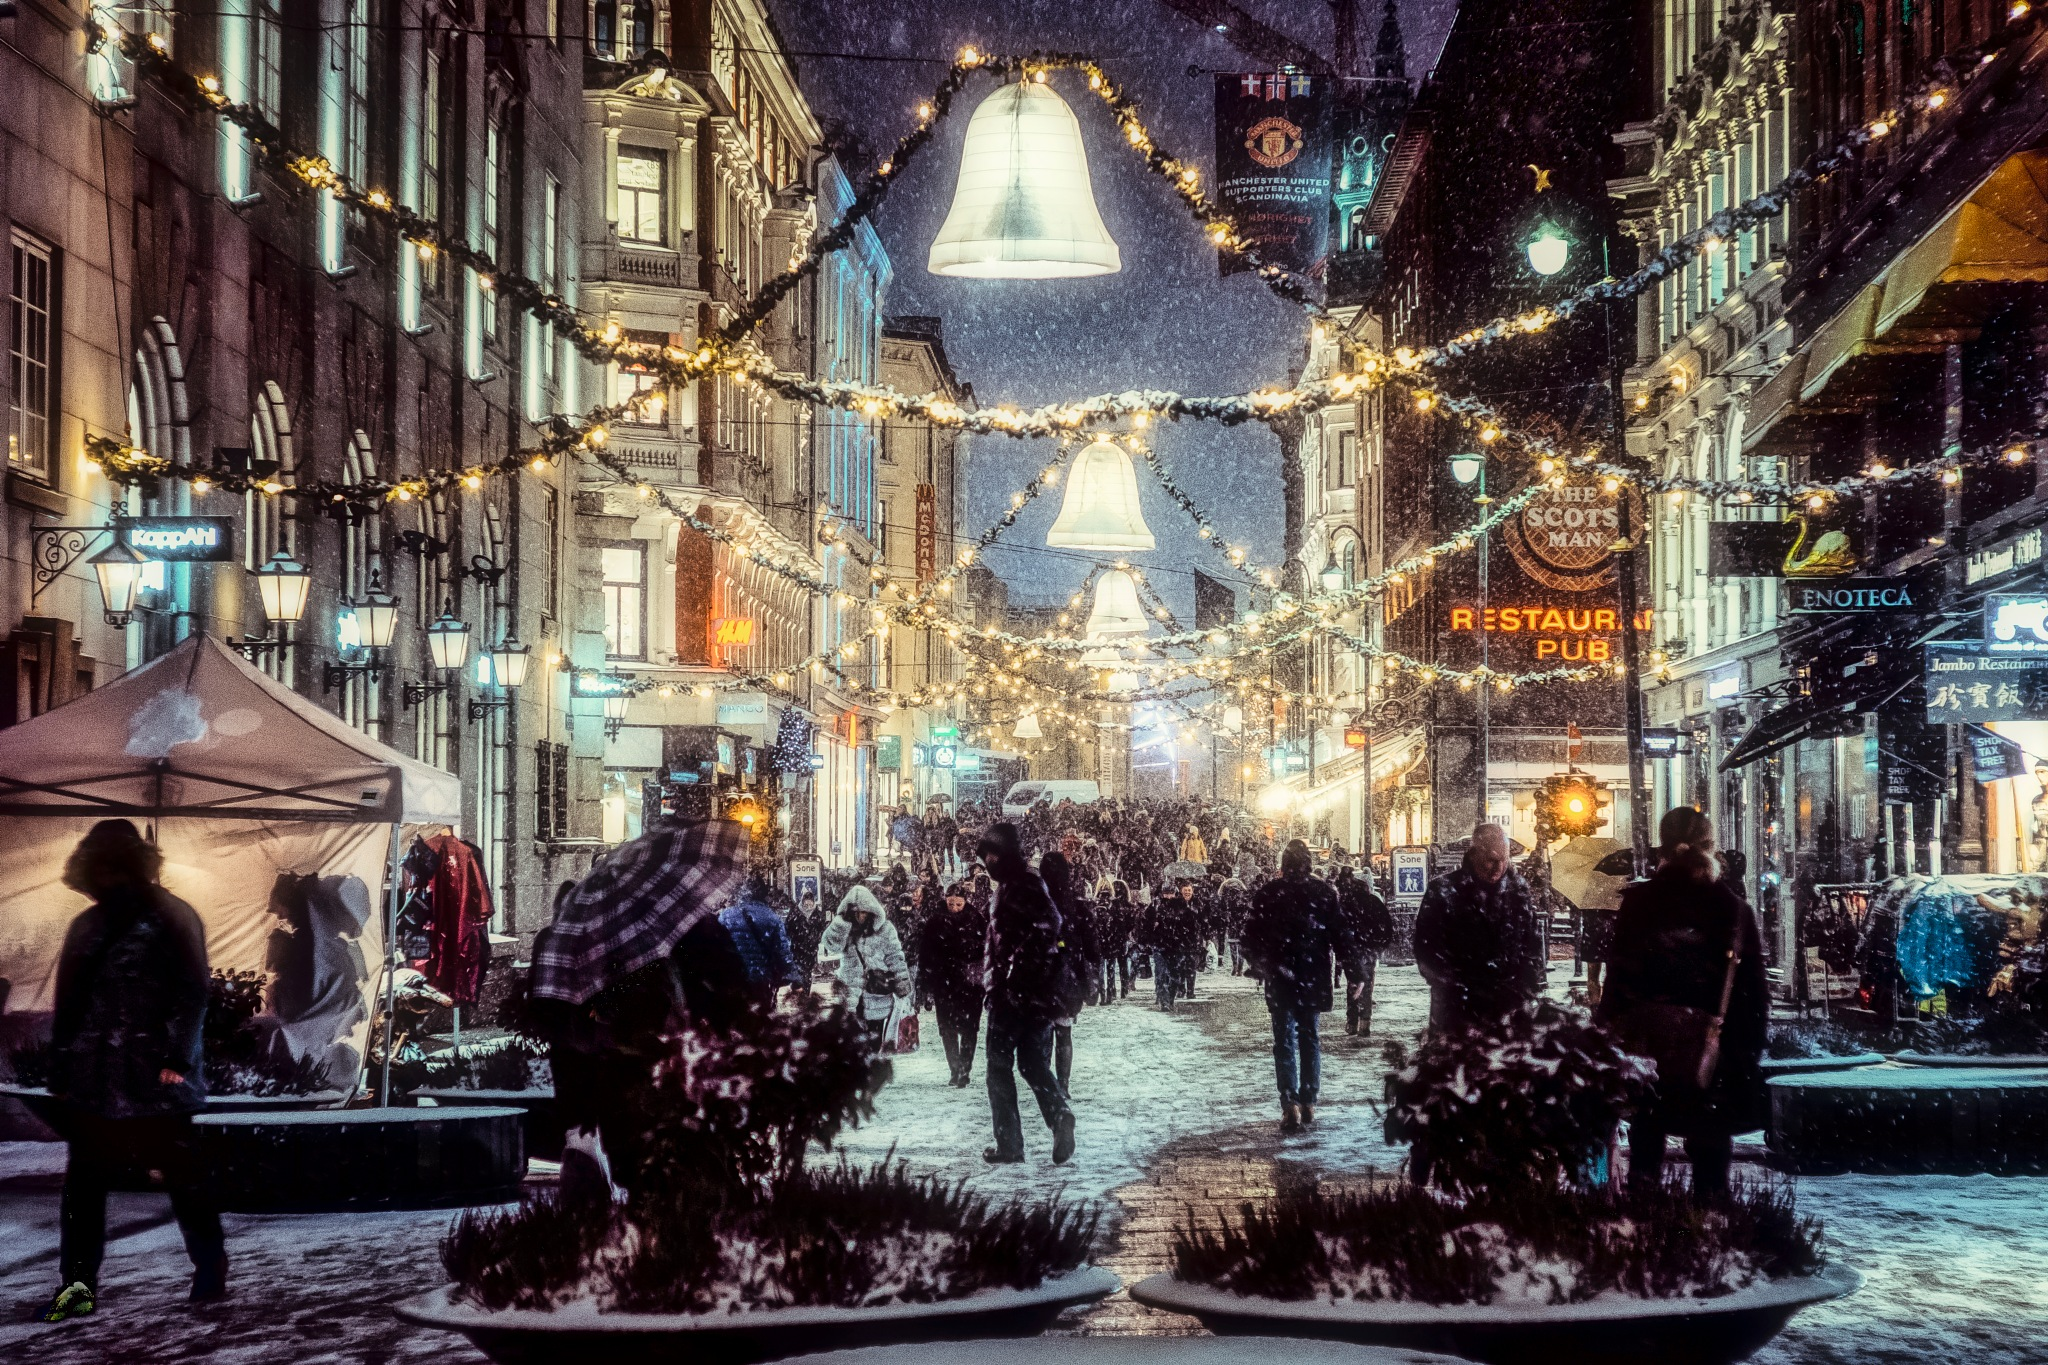 Christmas is close - Advent in Oslo by Goran Jorganovich